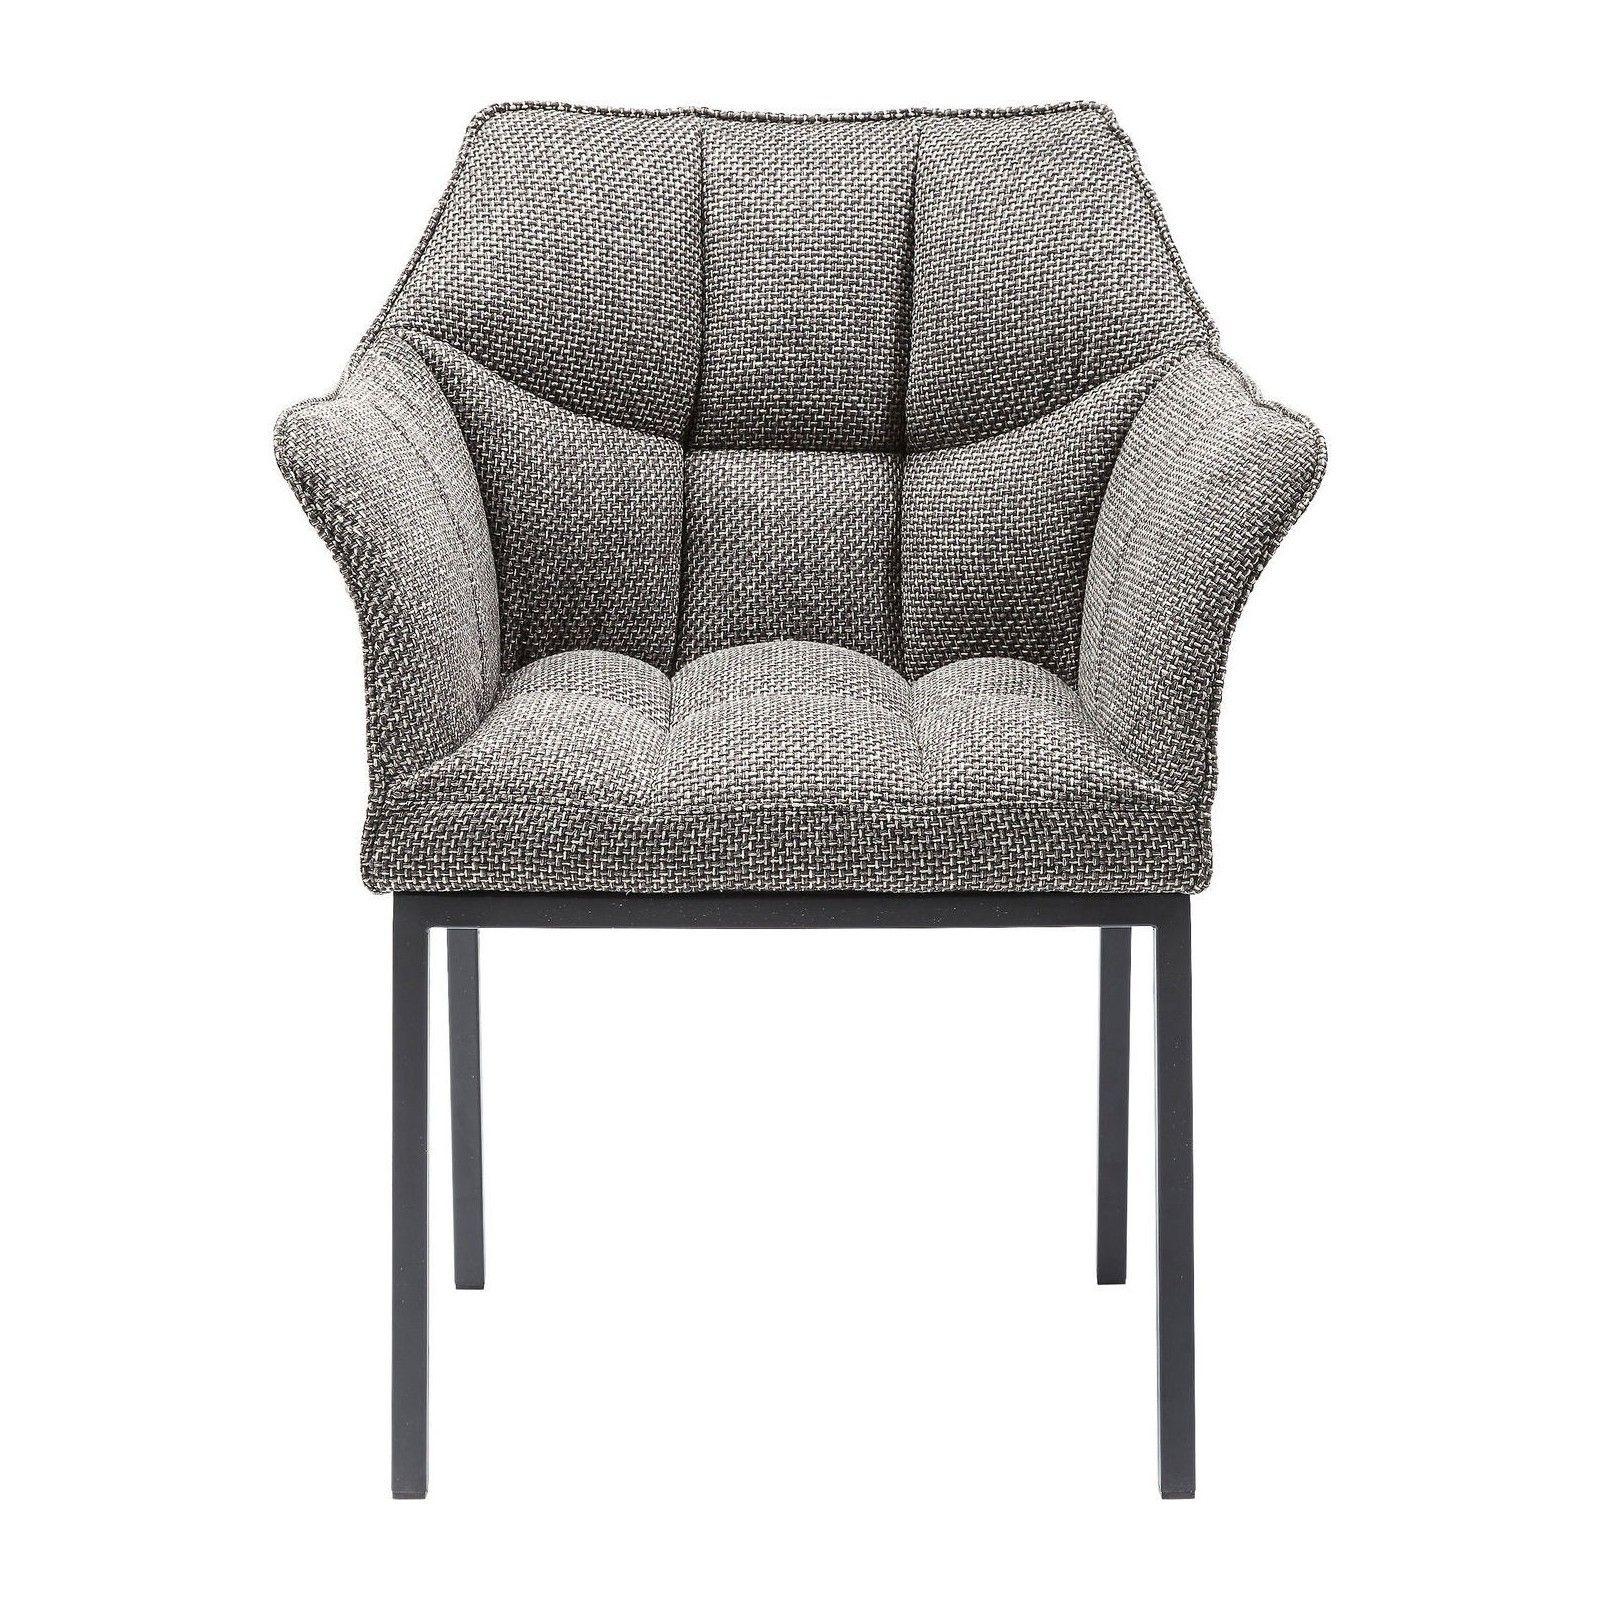 Chaise Moderne Grise Thinktank Kare Design Chaise Salle A Manger Fauteuil Salle A Manger Chaises De Table A Manger